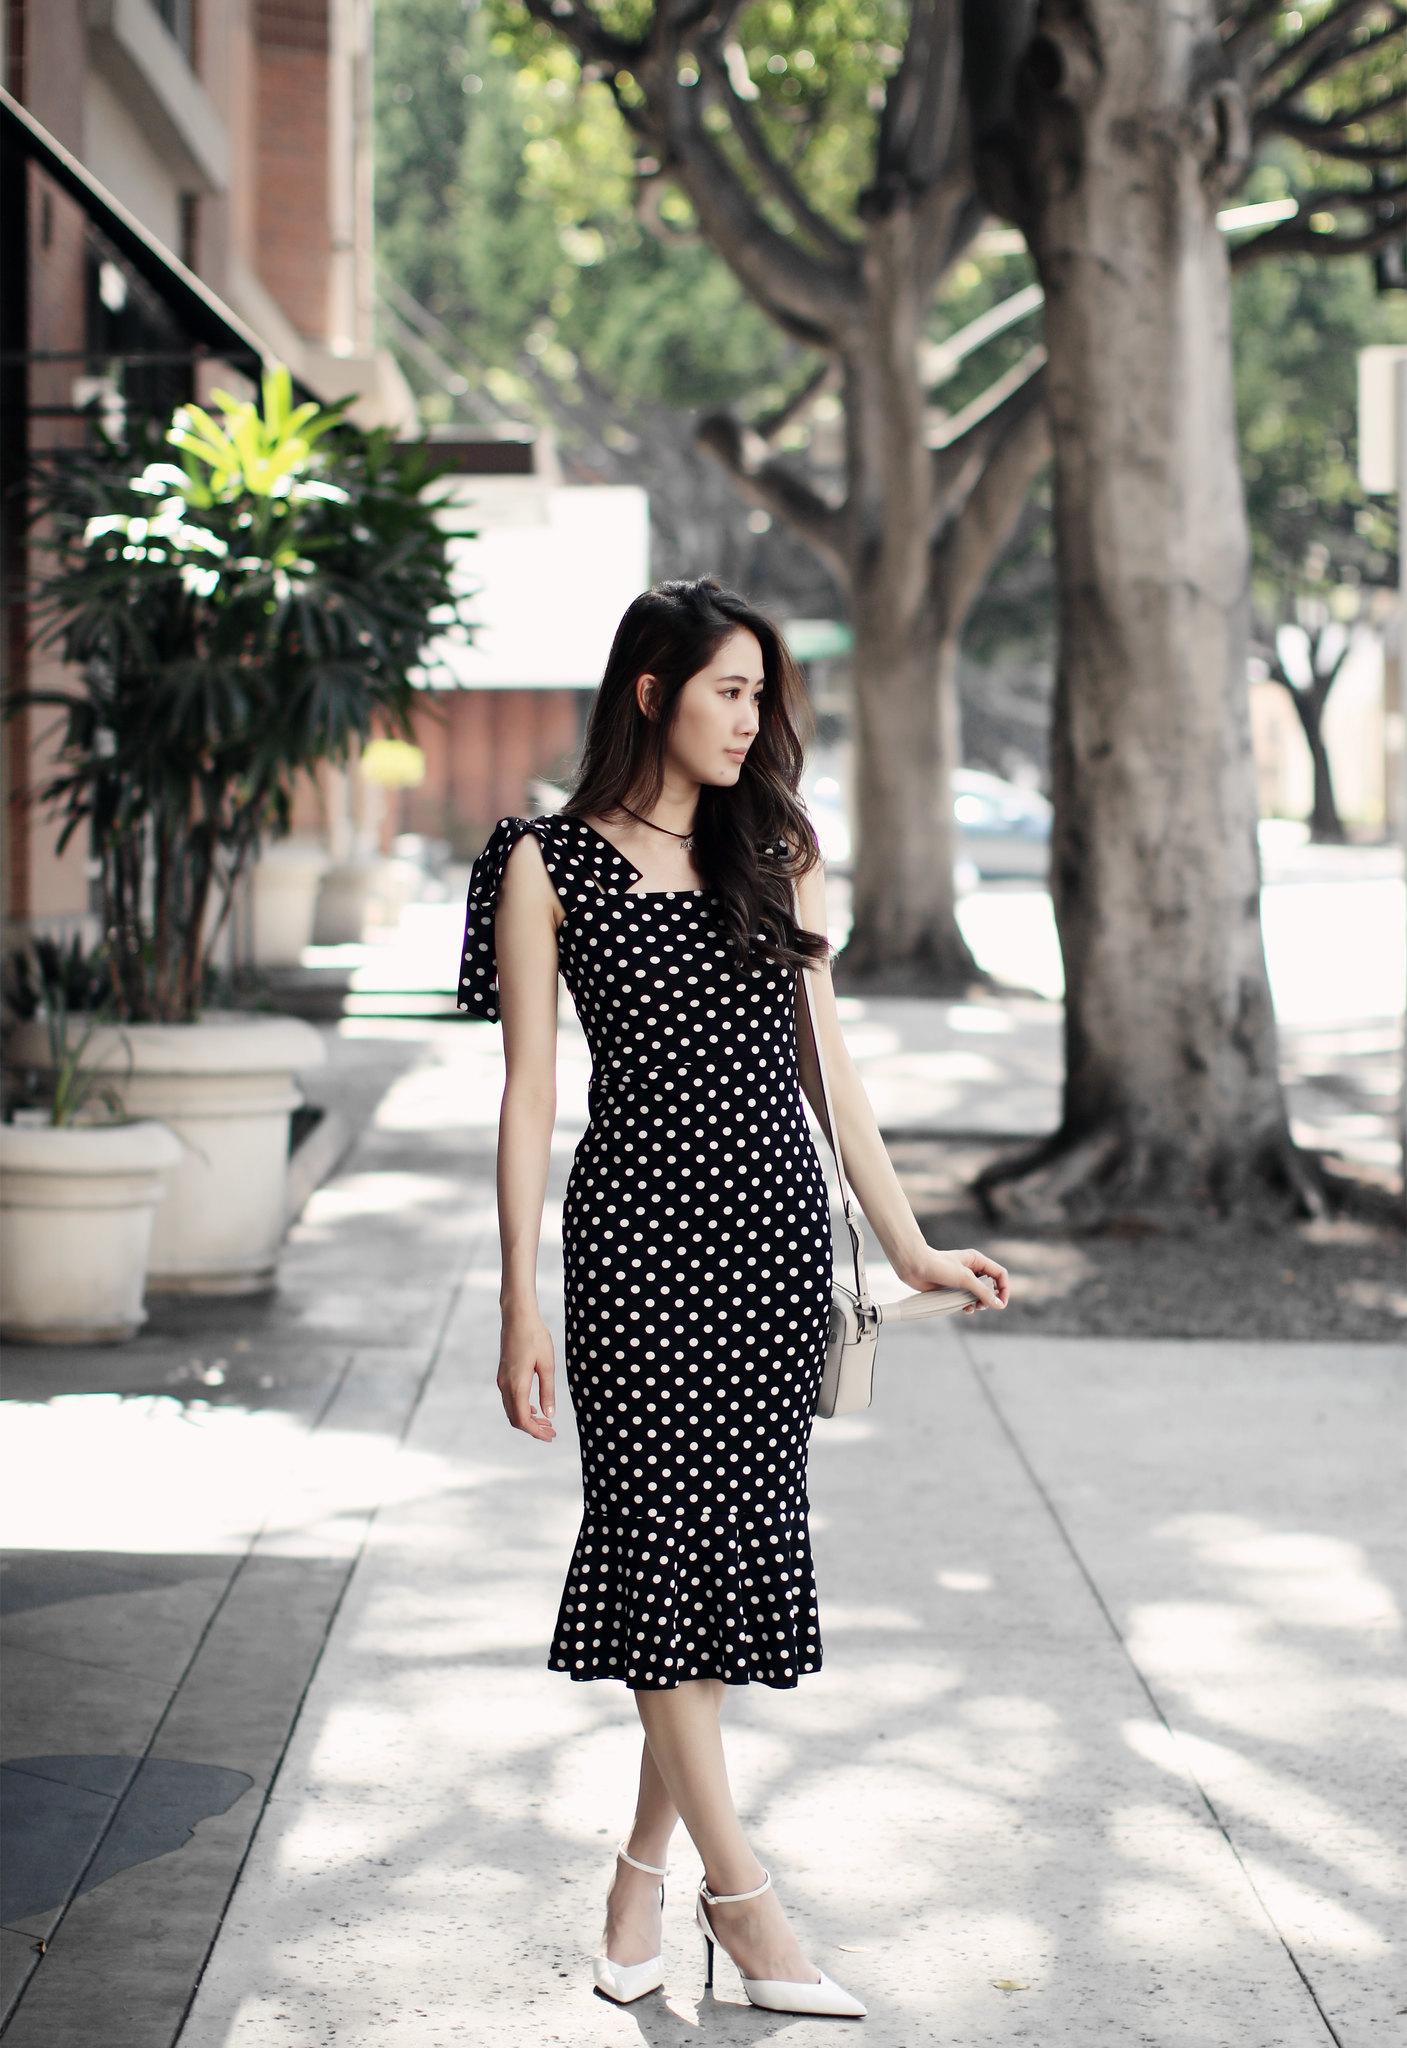 5599-ootd-fashion-style-outfitoftheday-wiwt-streetstyle-sponsored-bershka-shein-sheinofficial-romper-dress-bohochic-summer-elizabeeetht-clothestoyouuu